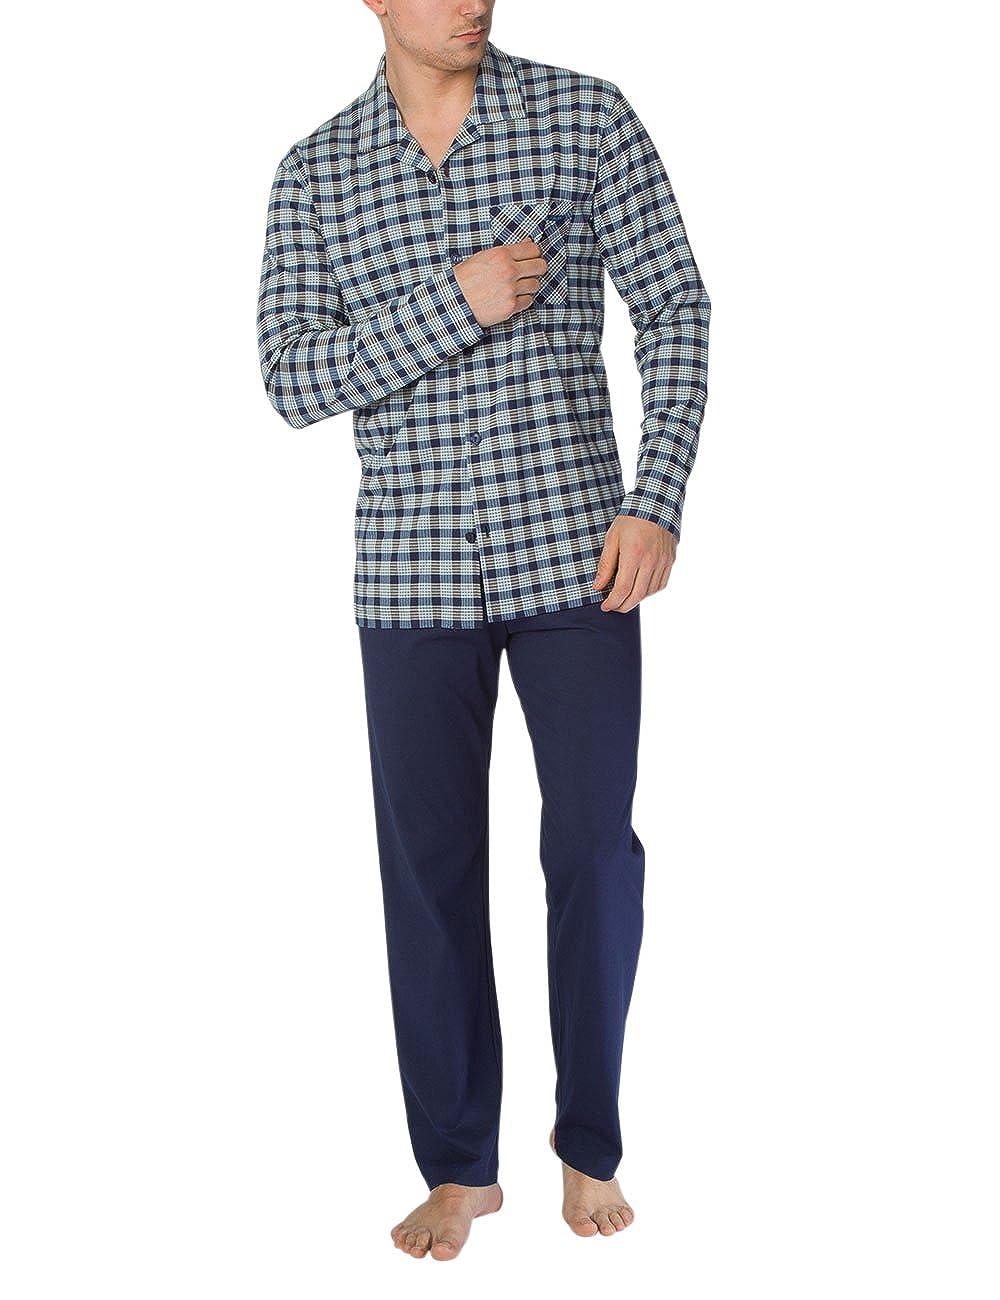 Mehrfarbig (Dark Blau 449) Calida Bill Herren Pyjama ZWeißeiliger Schlafanzug